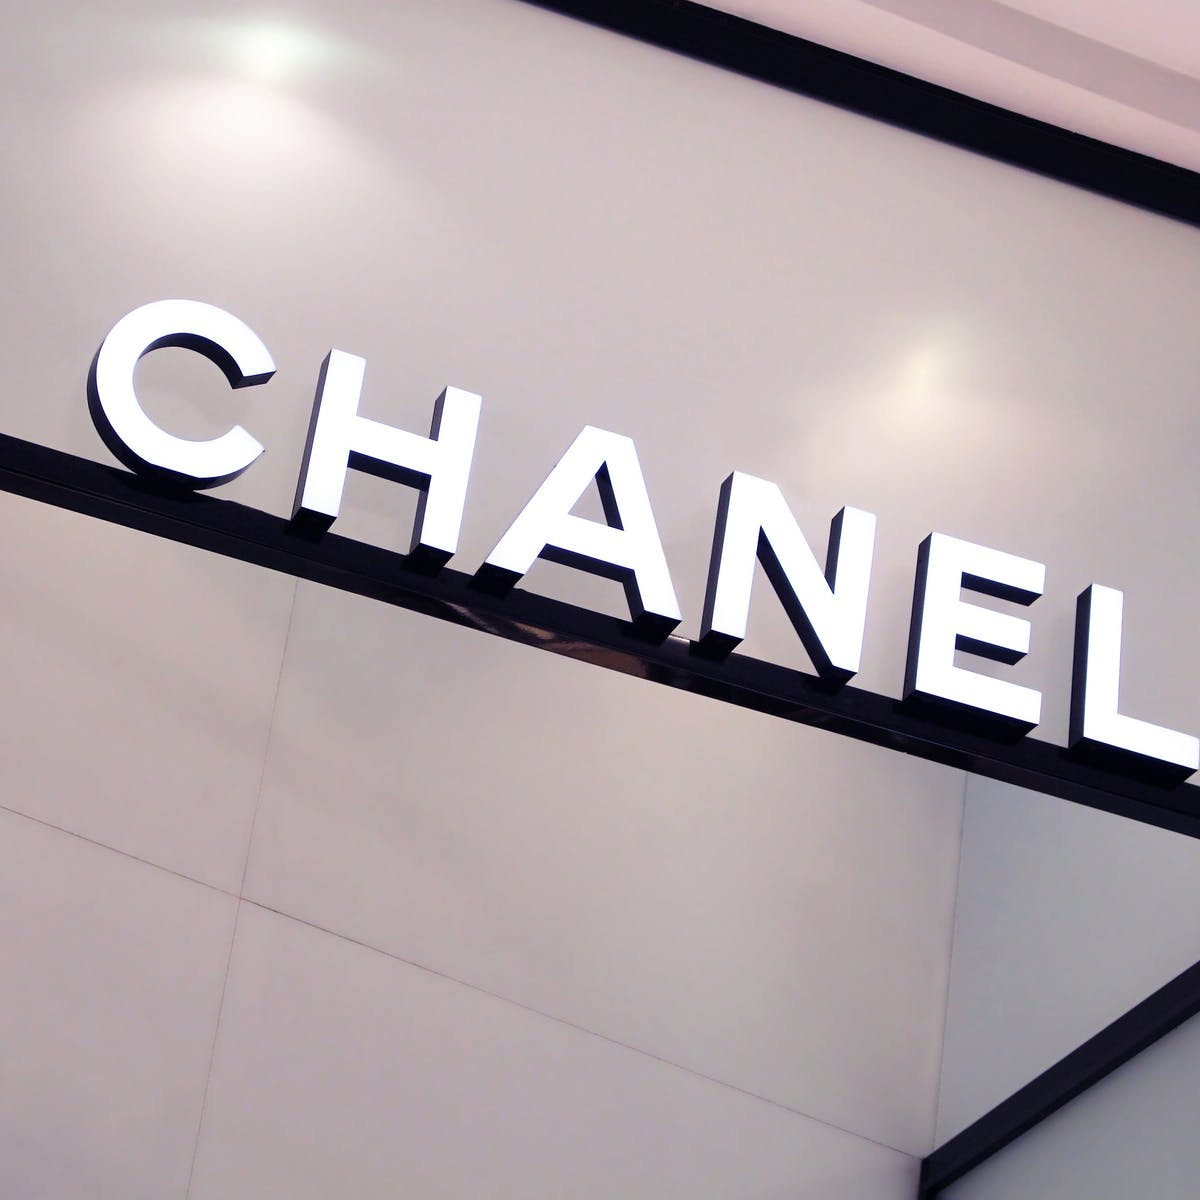 Chanel's new fragrance reminds us of the rebel entrepreneur